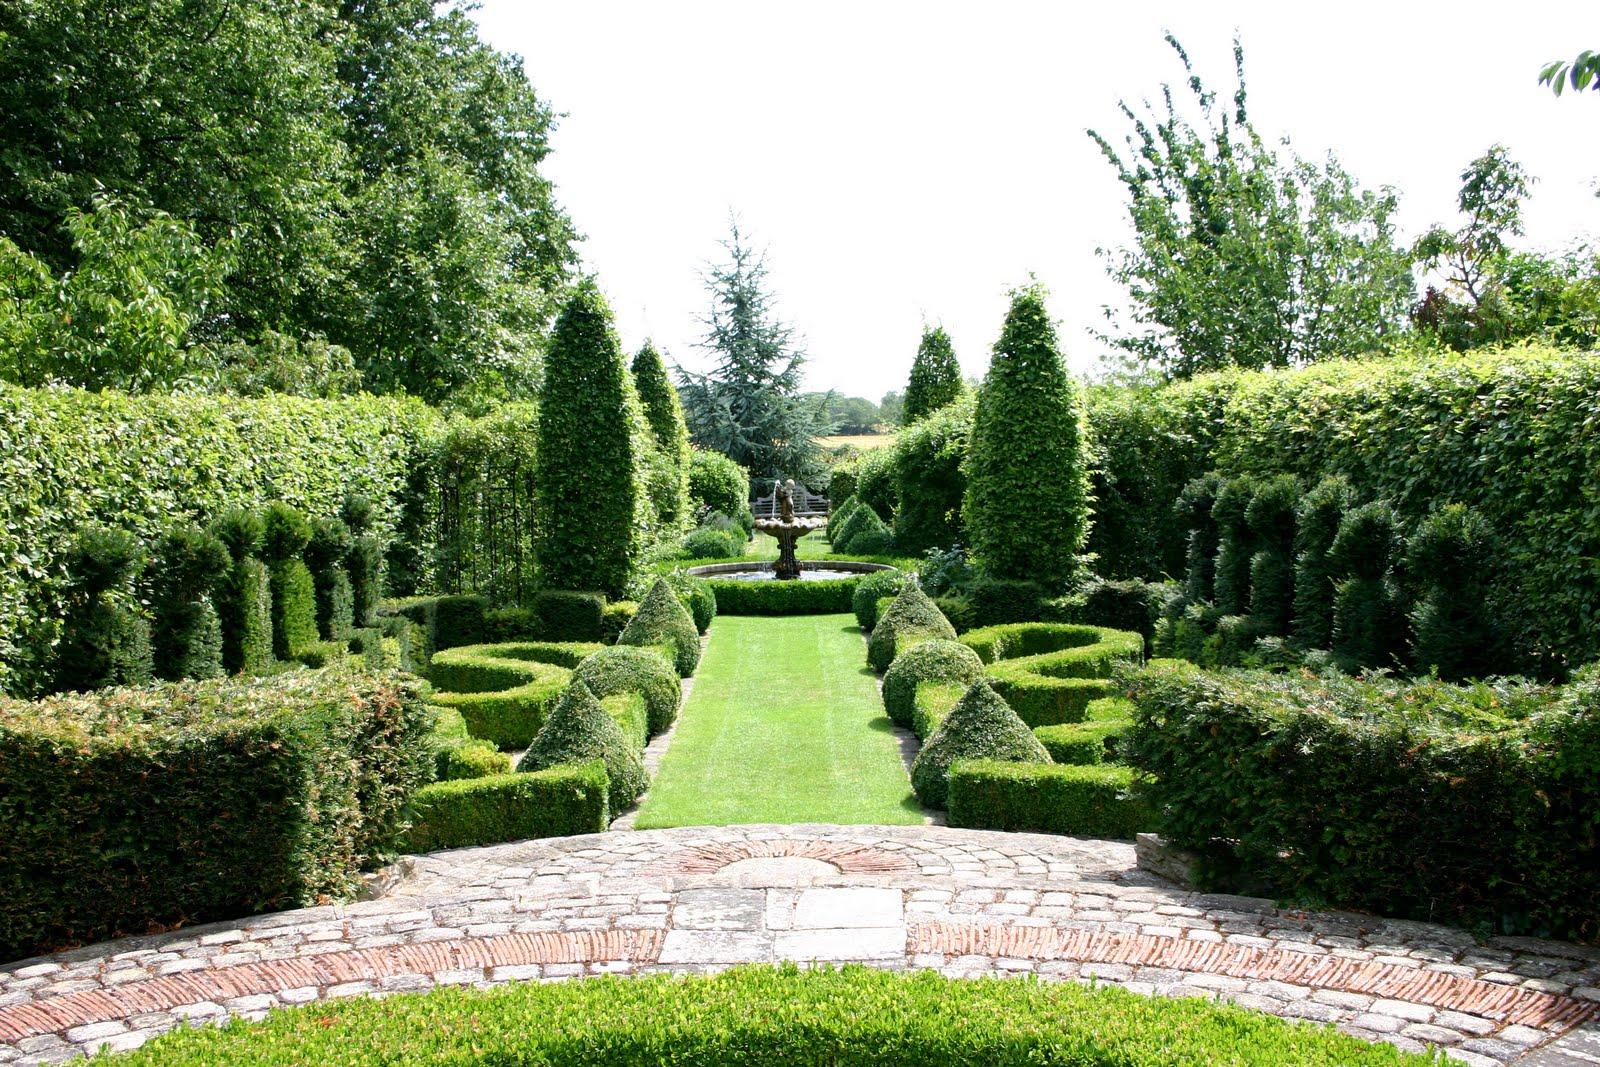 French backyard gardens - French Backyard Gardens 5